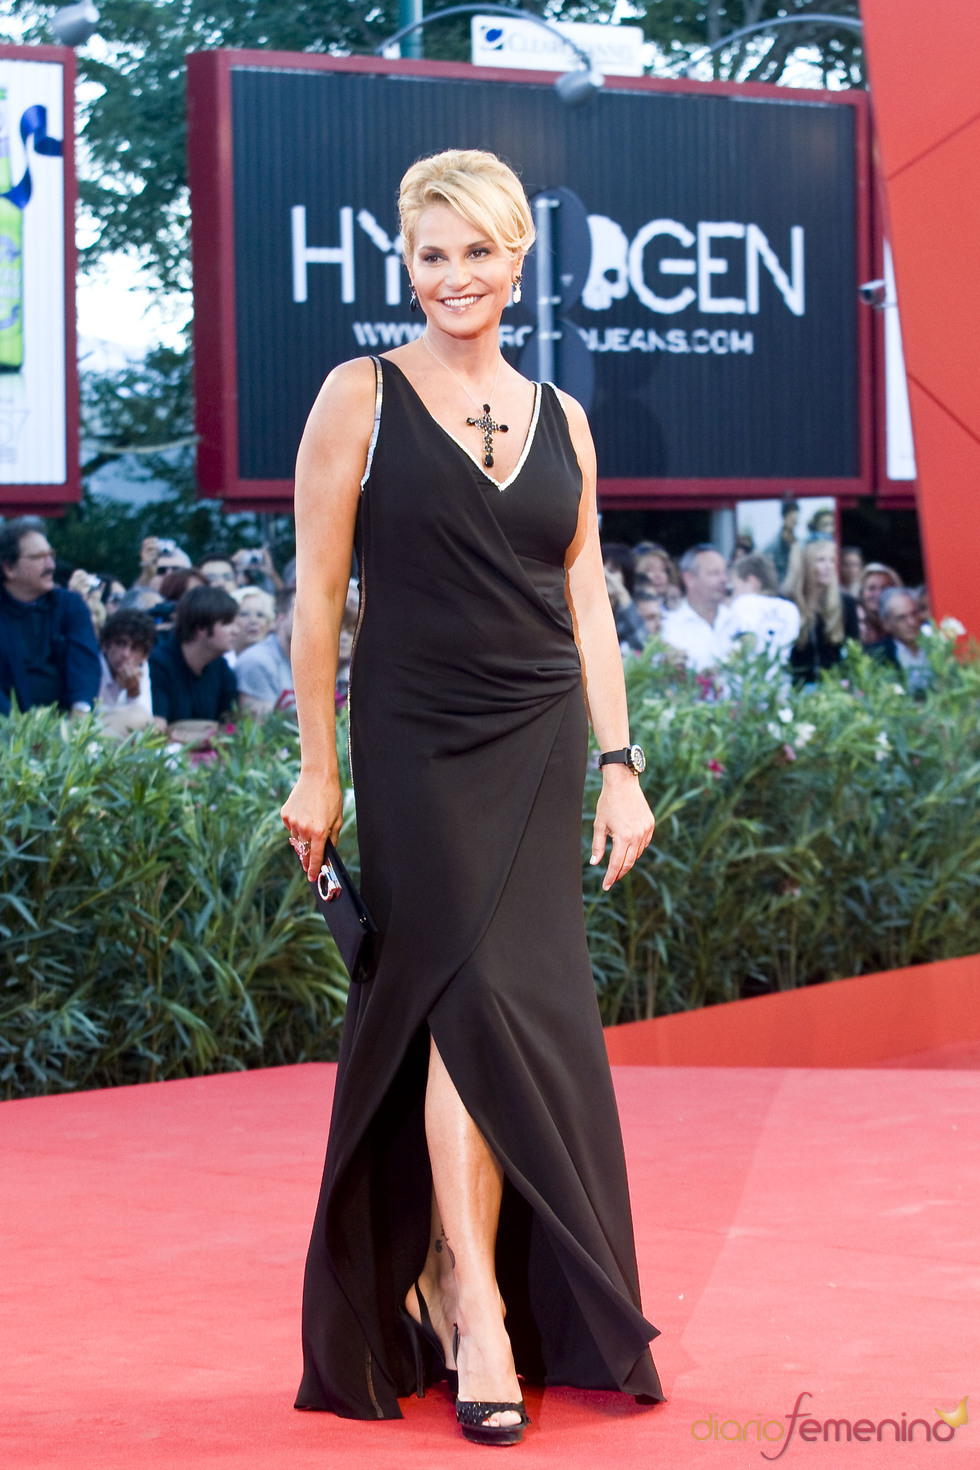 Simona Ventura con vestido negro